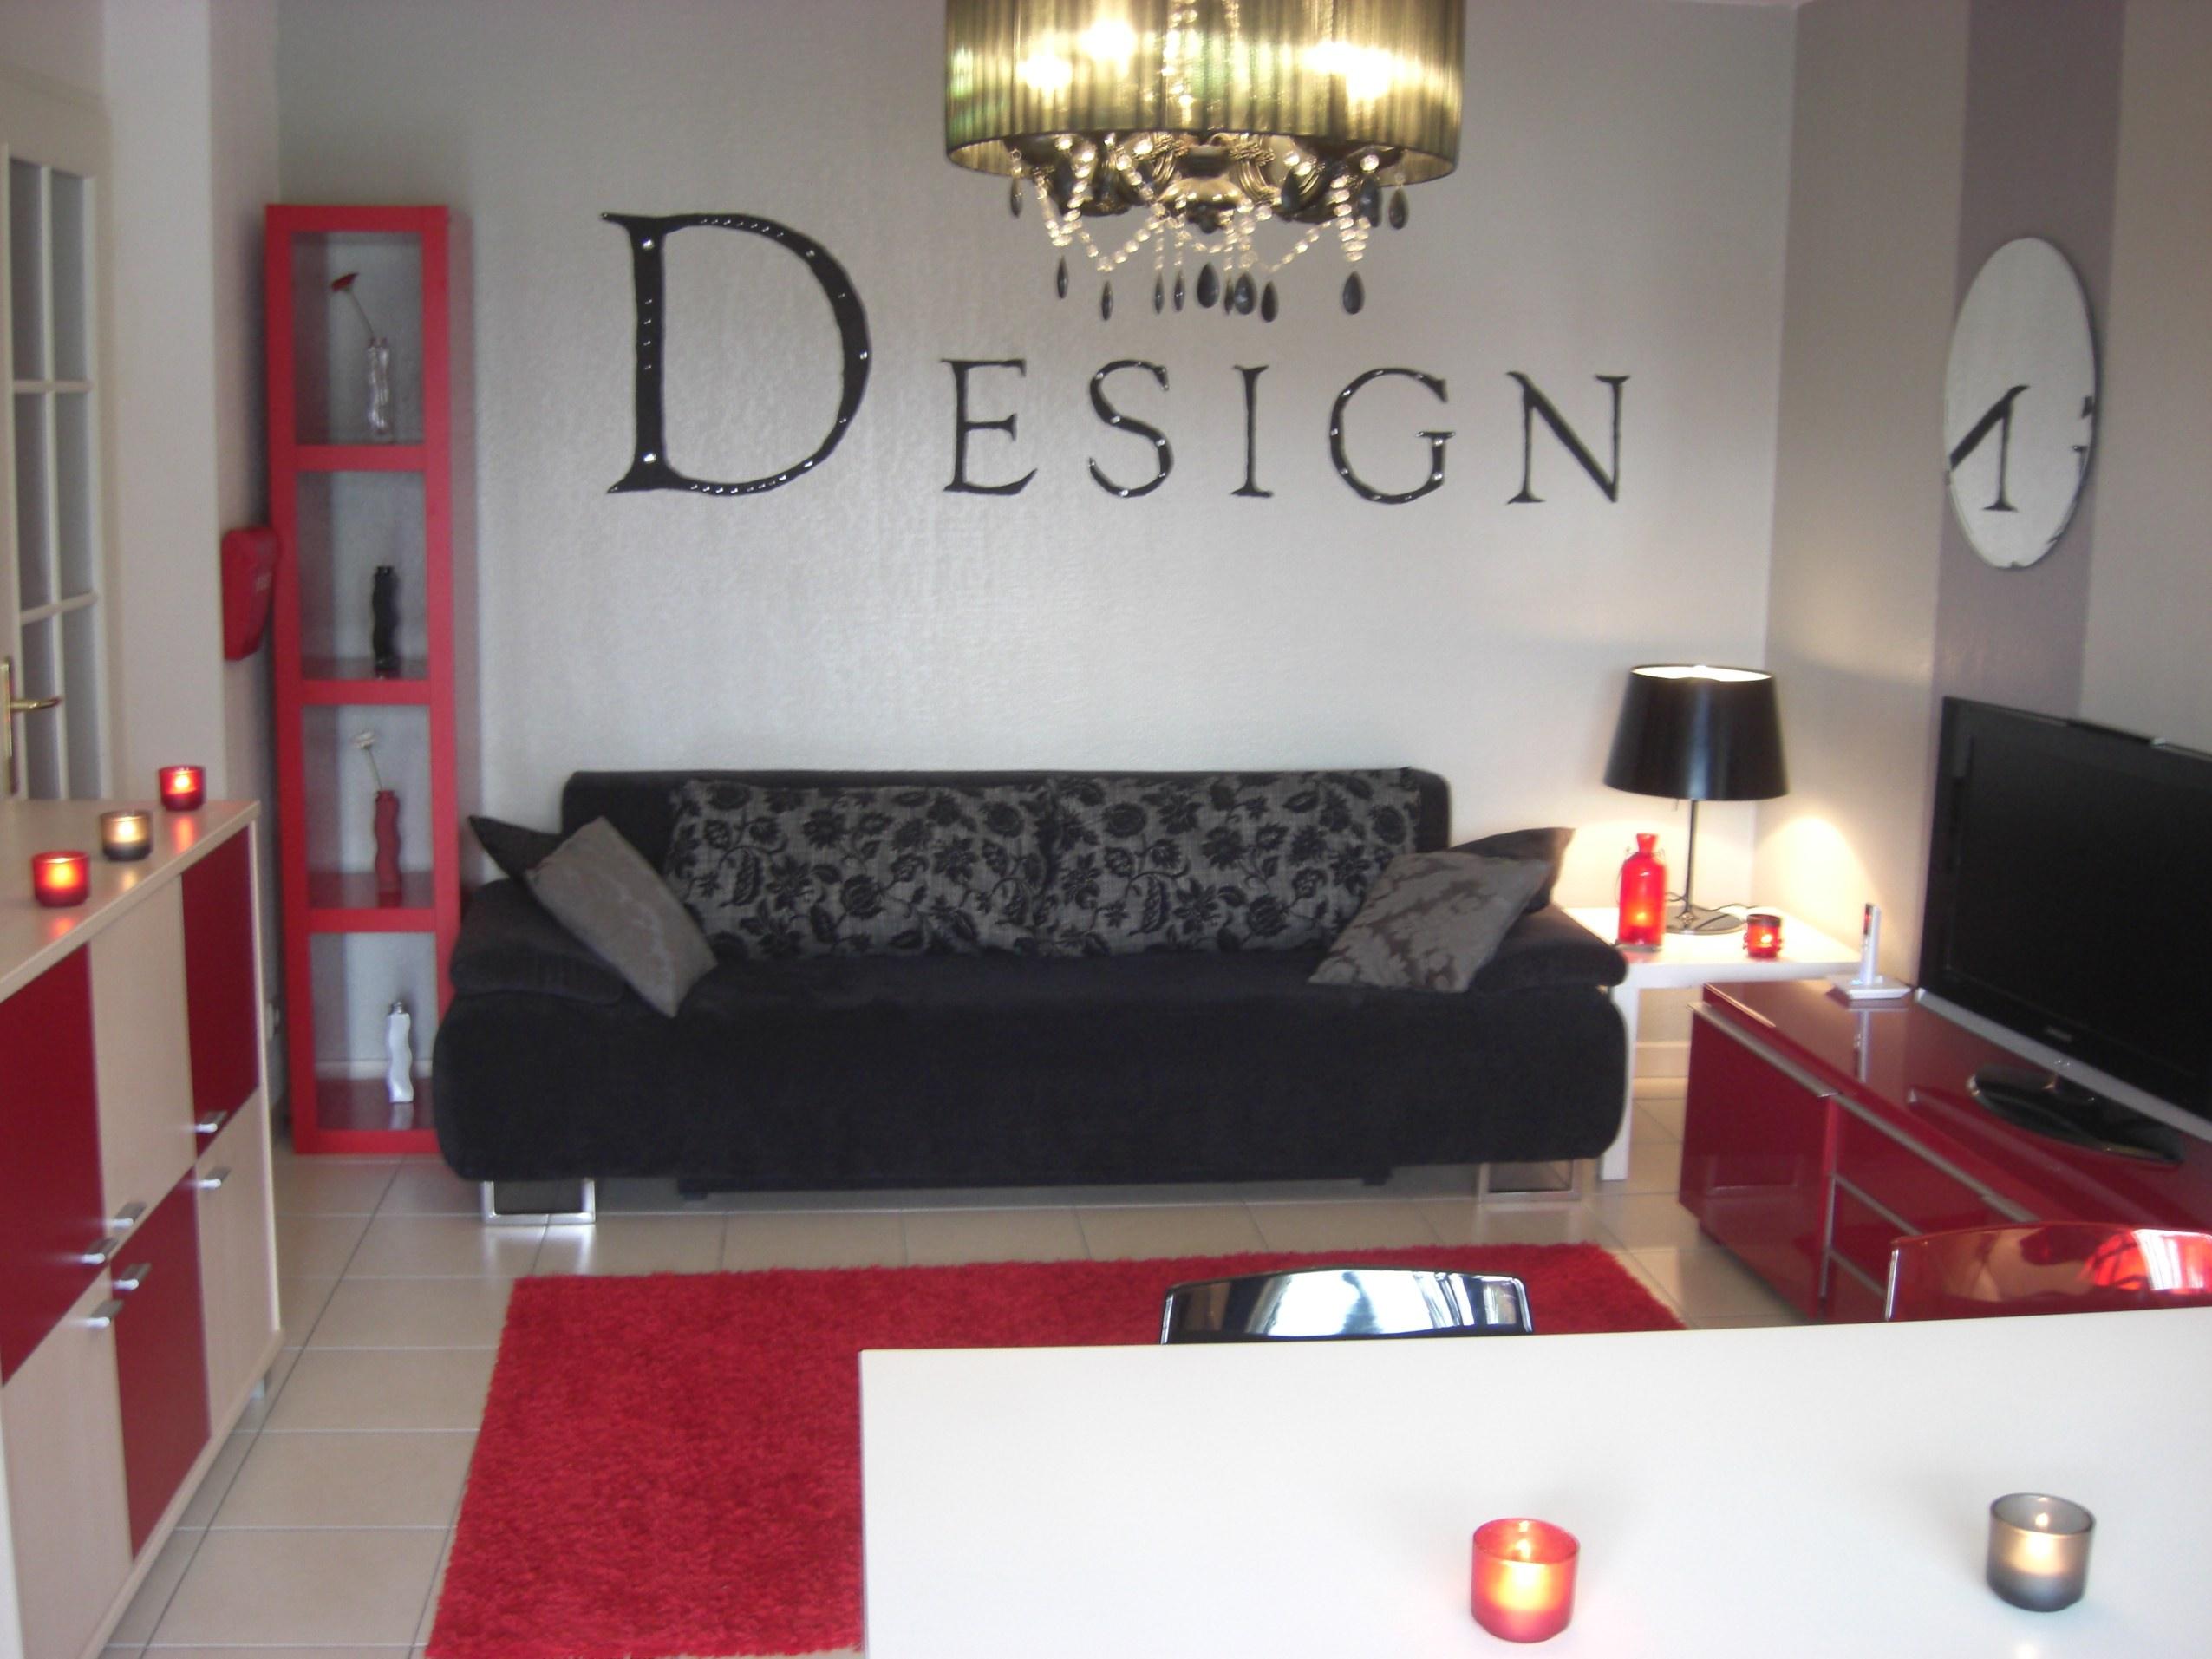 Salon Design Photo Wallpapers Gallery 17774 Wallpaper Bigwol 2551x1913